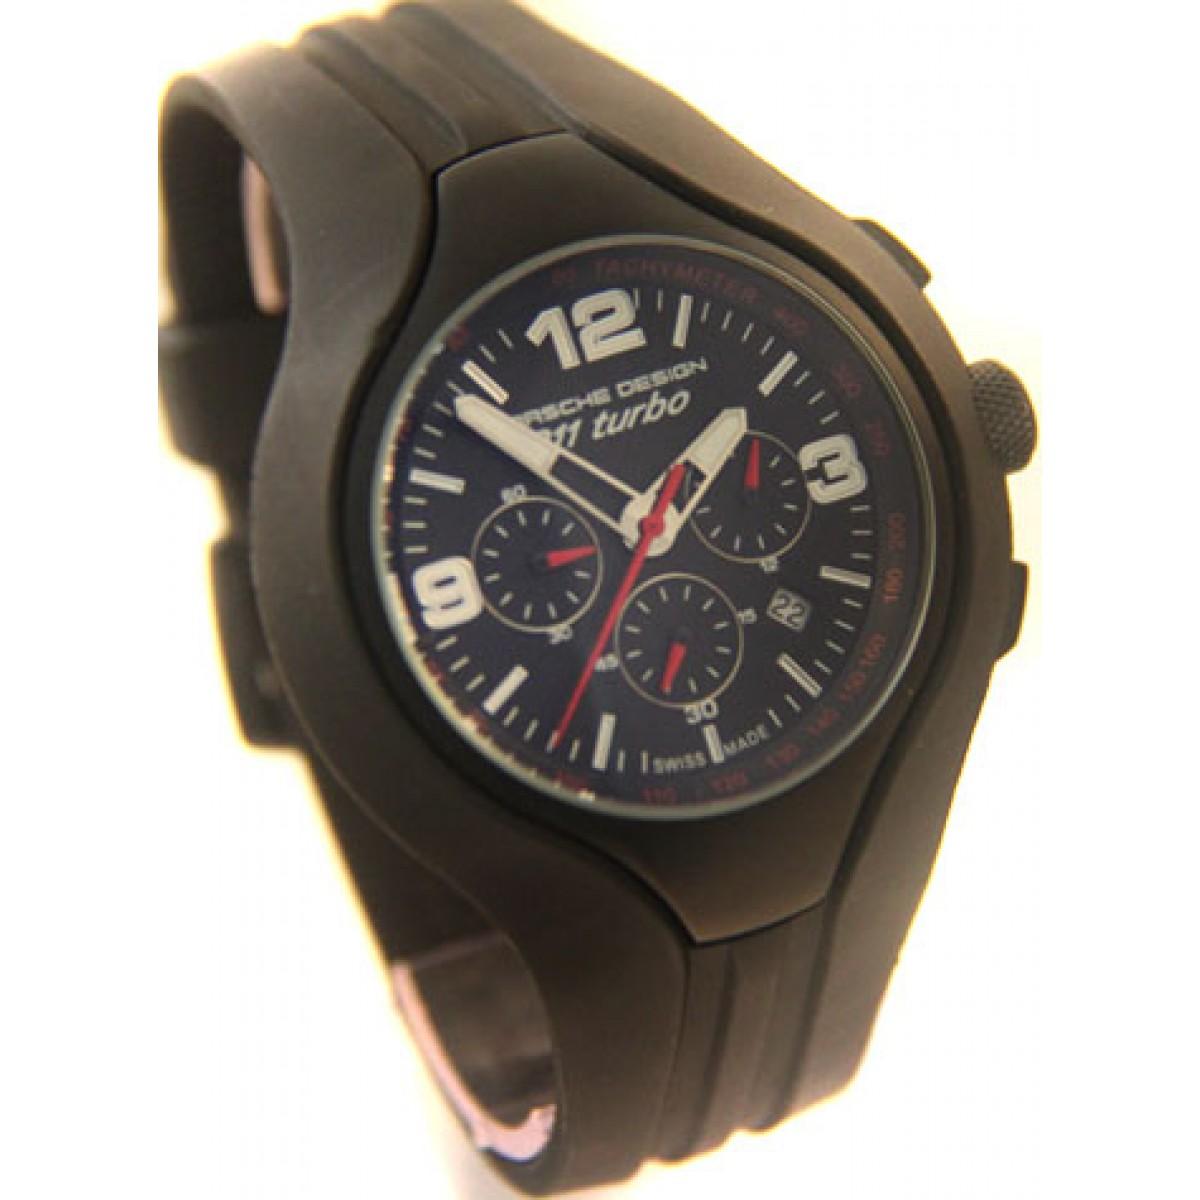 4bb0cb77b85 Relógio Réplica Porche Design 911 Turbo Black